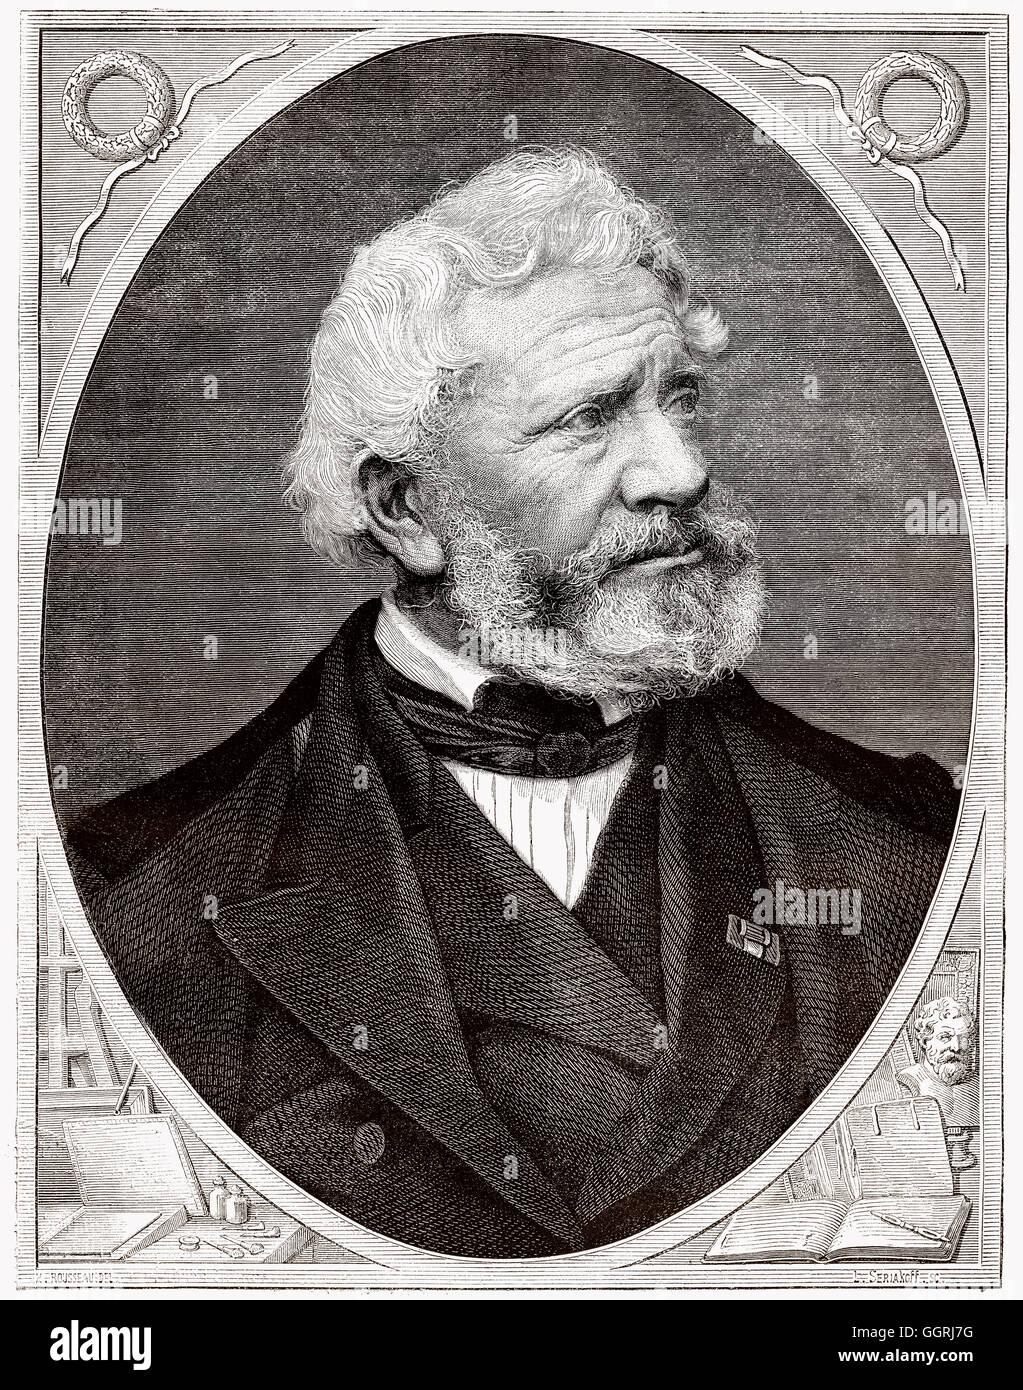 François Forster, 1790-1872, a French engraver - Stock Image